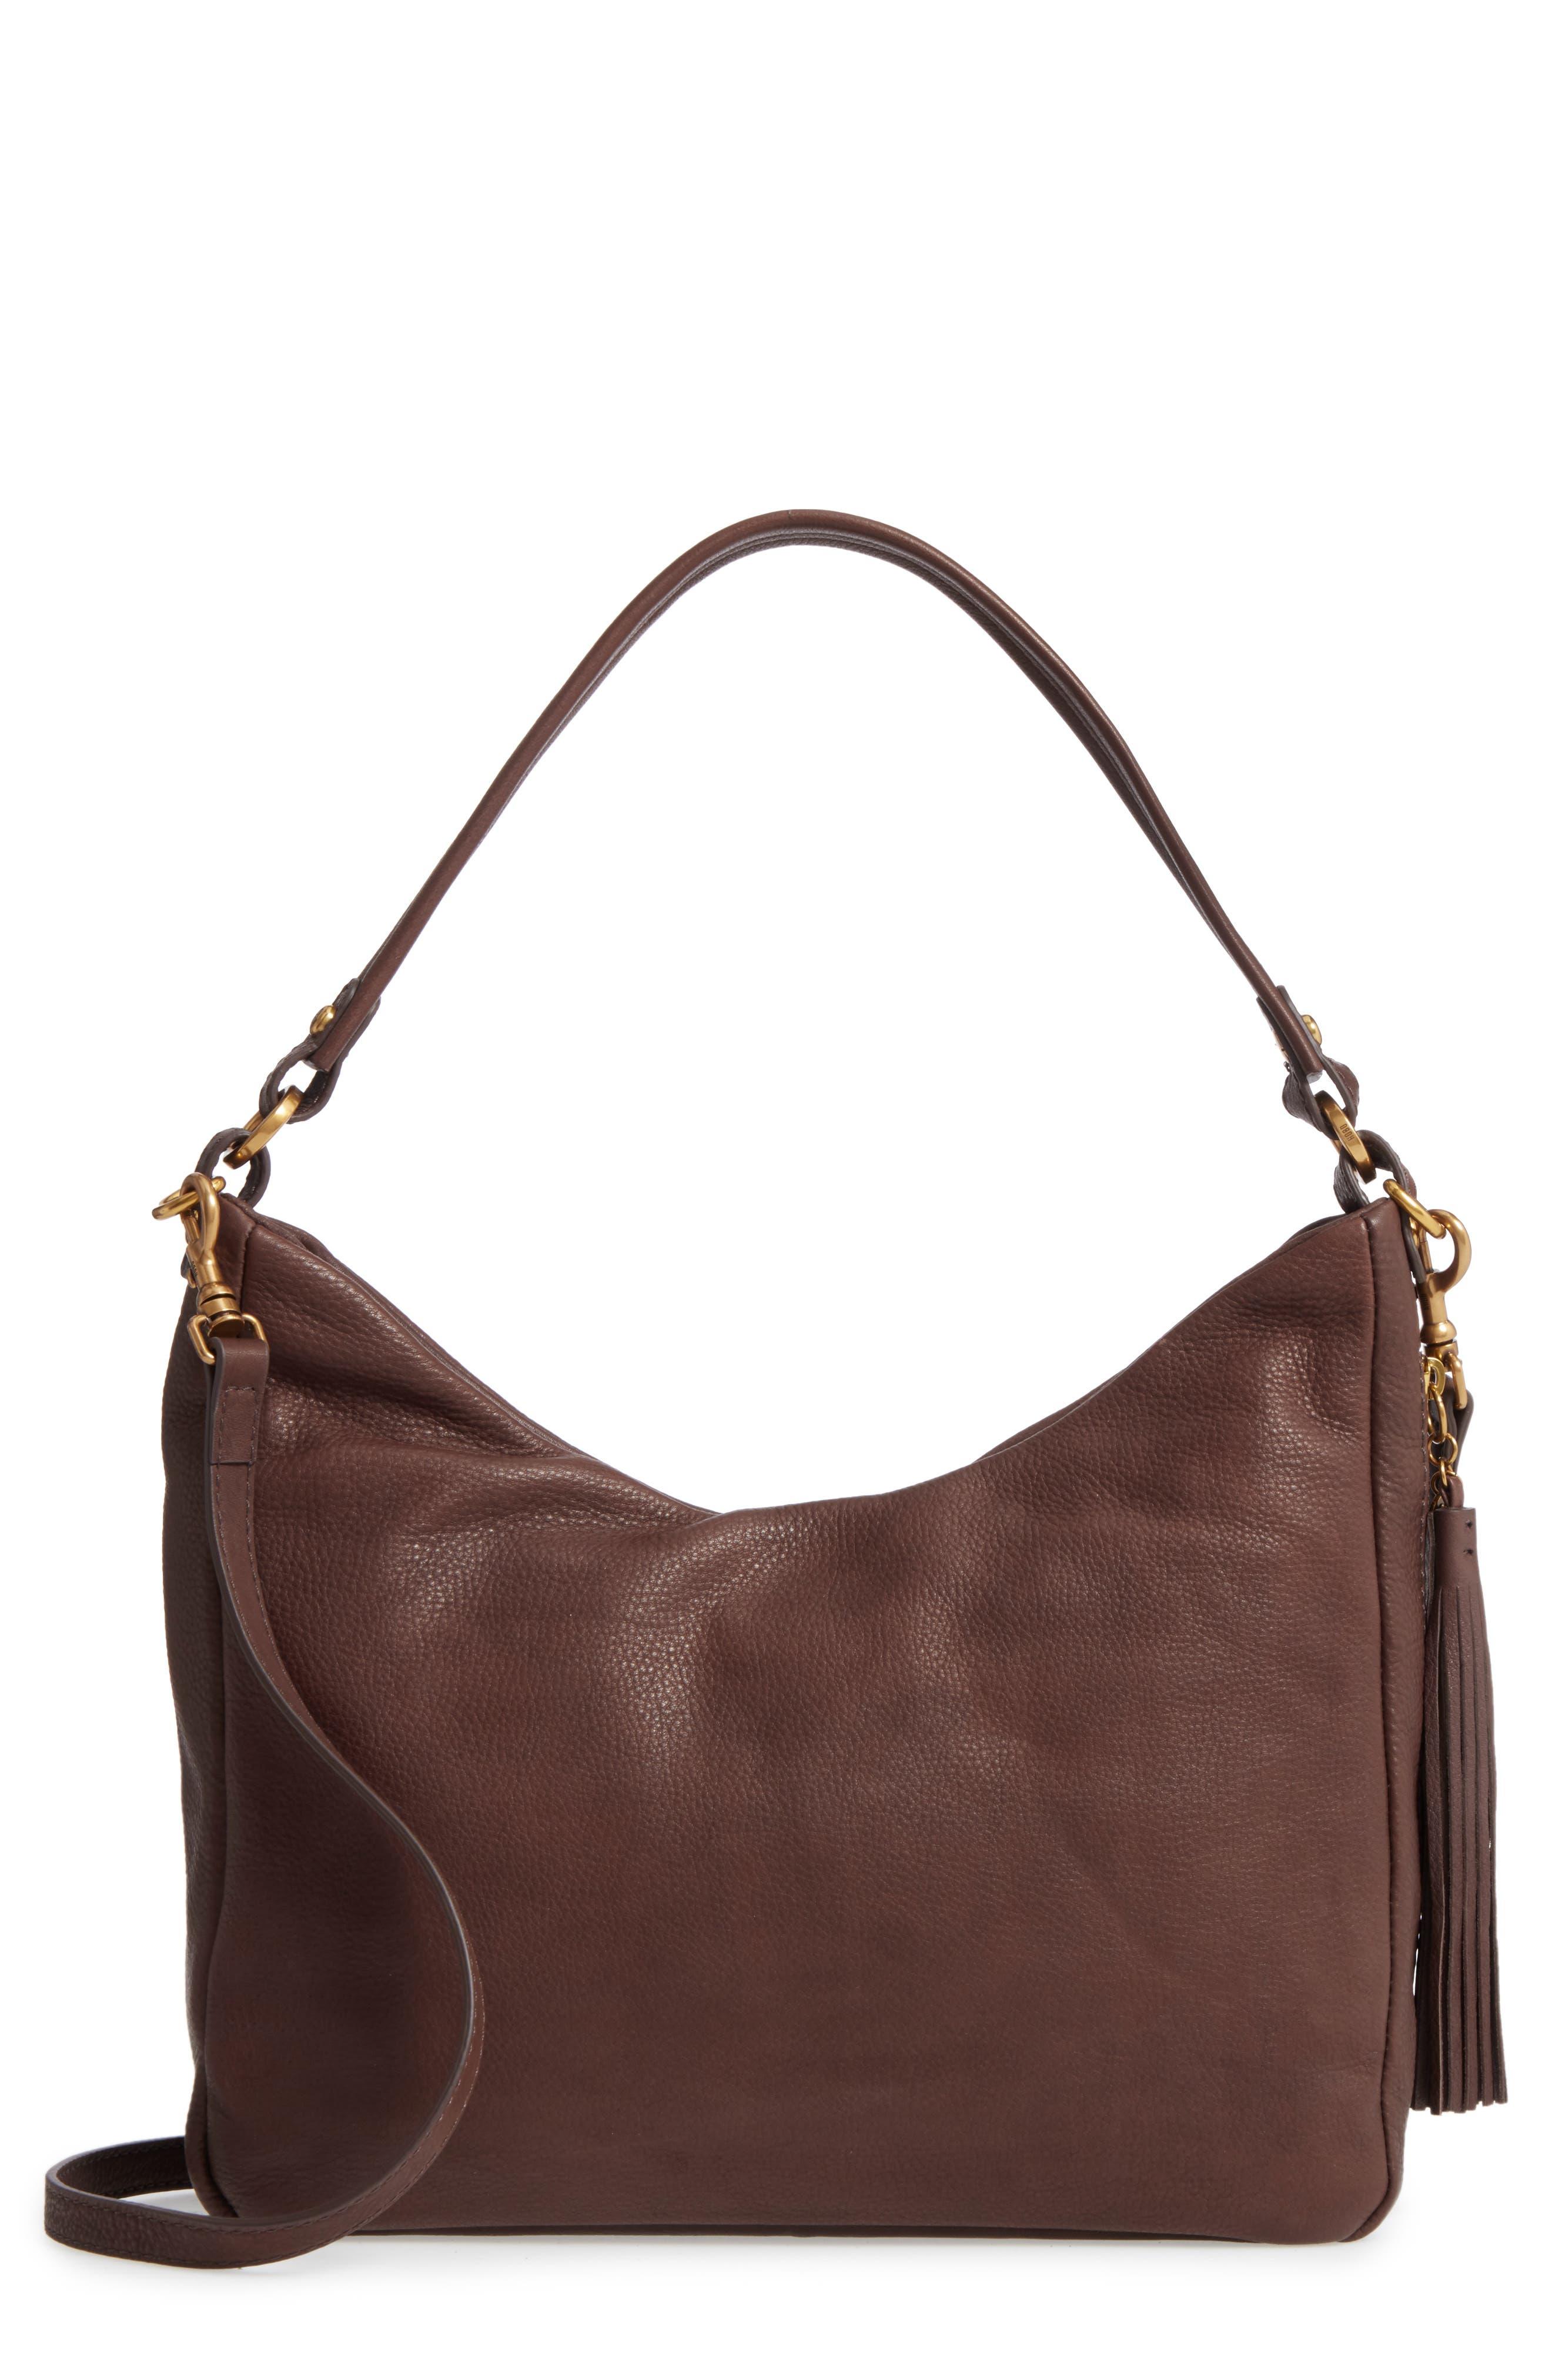 HOBO Delilah Convertible Calfskin Leather Hobo Bag